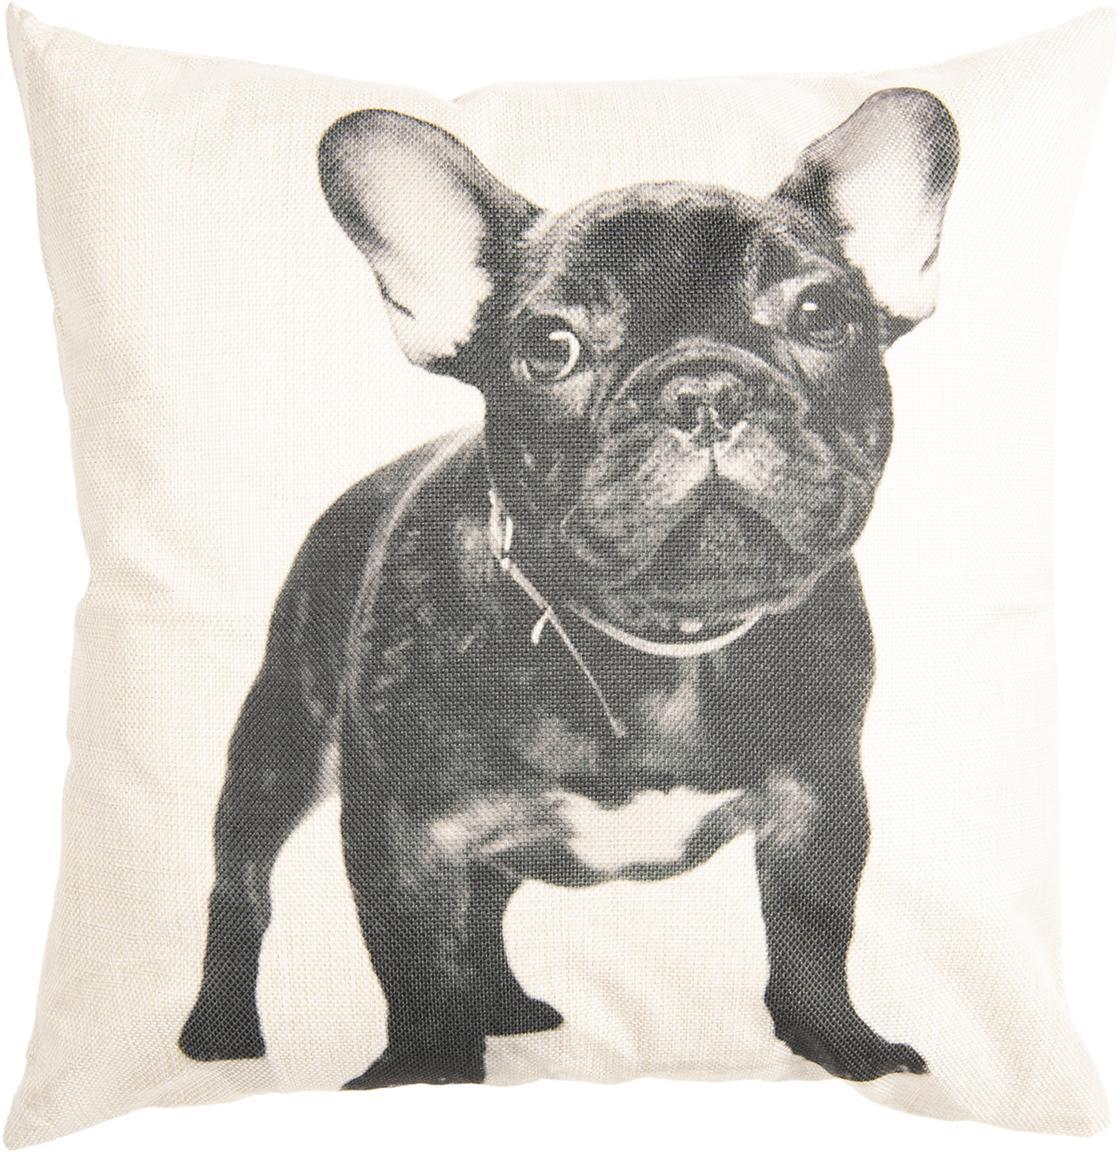 Federa arredo Dog, 100% poliestere, Bianco latteo, nero, Larg. 45 x Lung. 45 cm